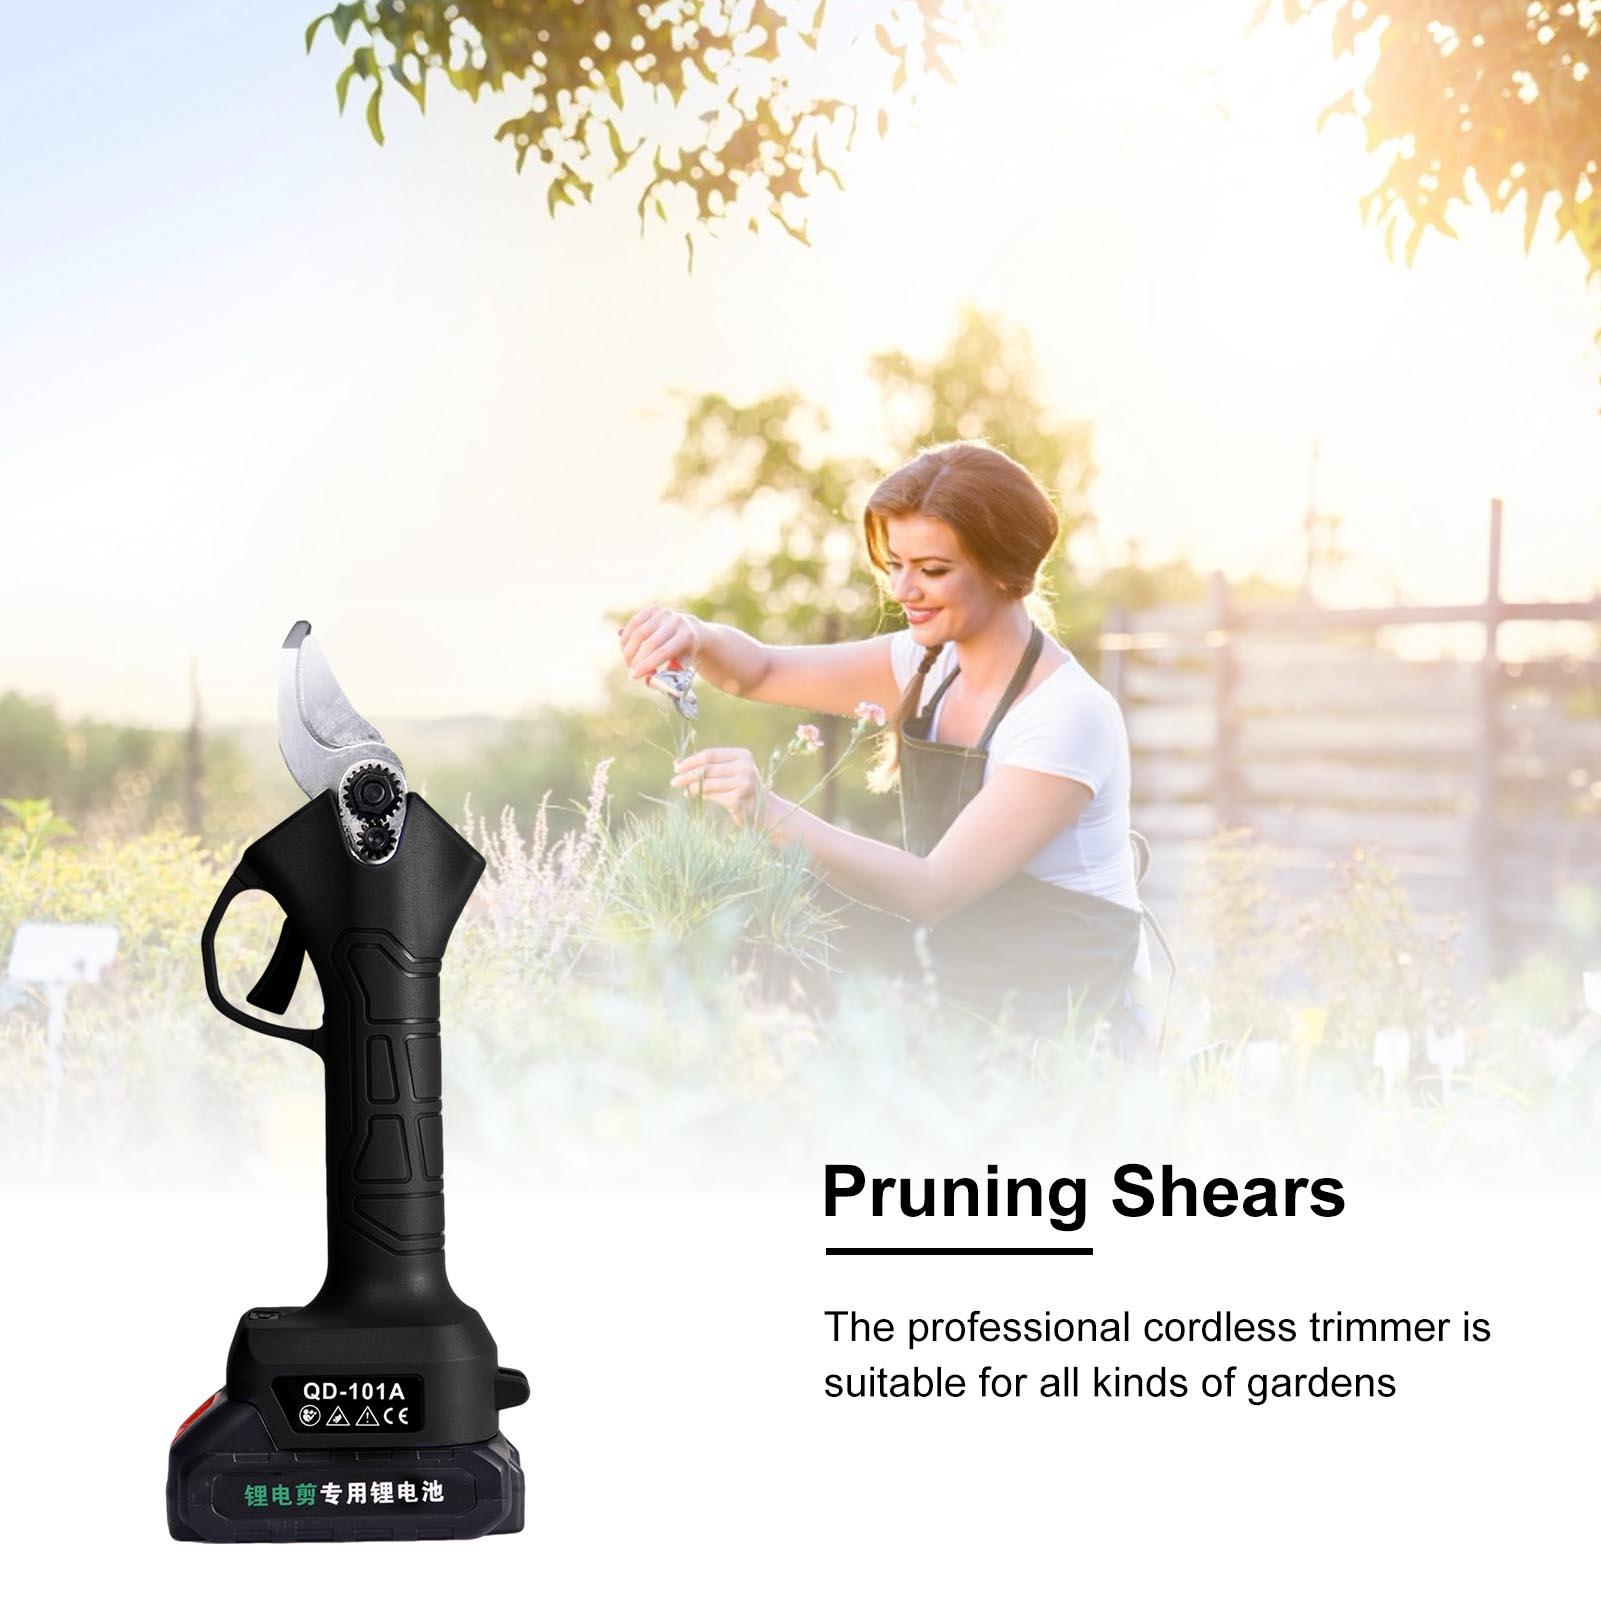 Tools : Electric Pruning Shear Cordless Secateurs 2PCS Lithium Battery Pruner Fruit Tree Branch Trimmer Cutter Scissor Garden Power Tool